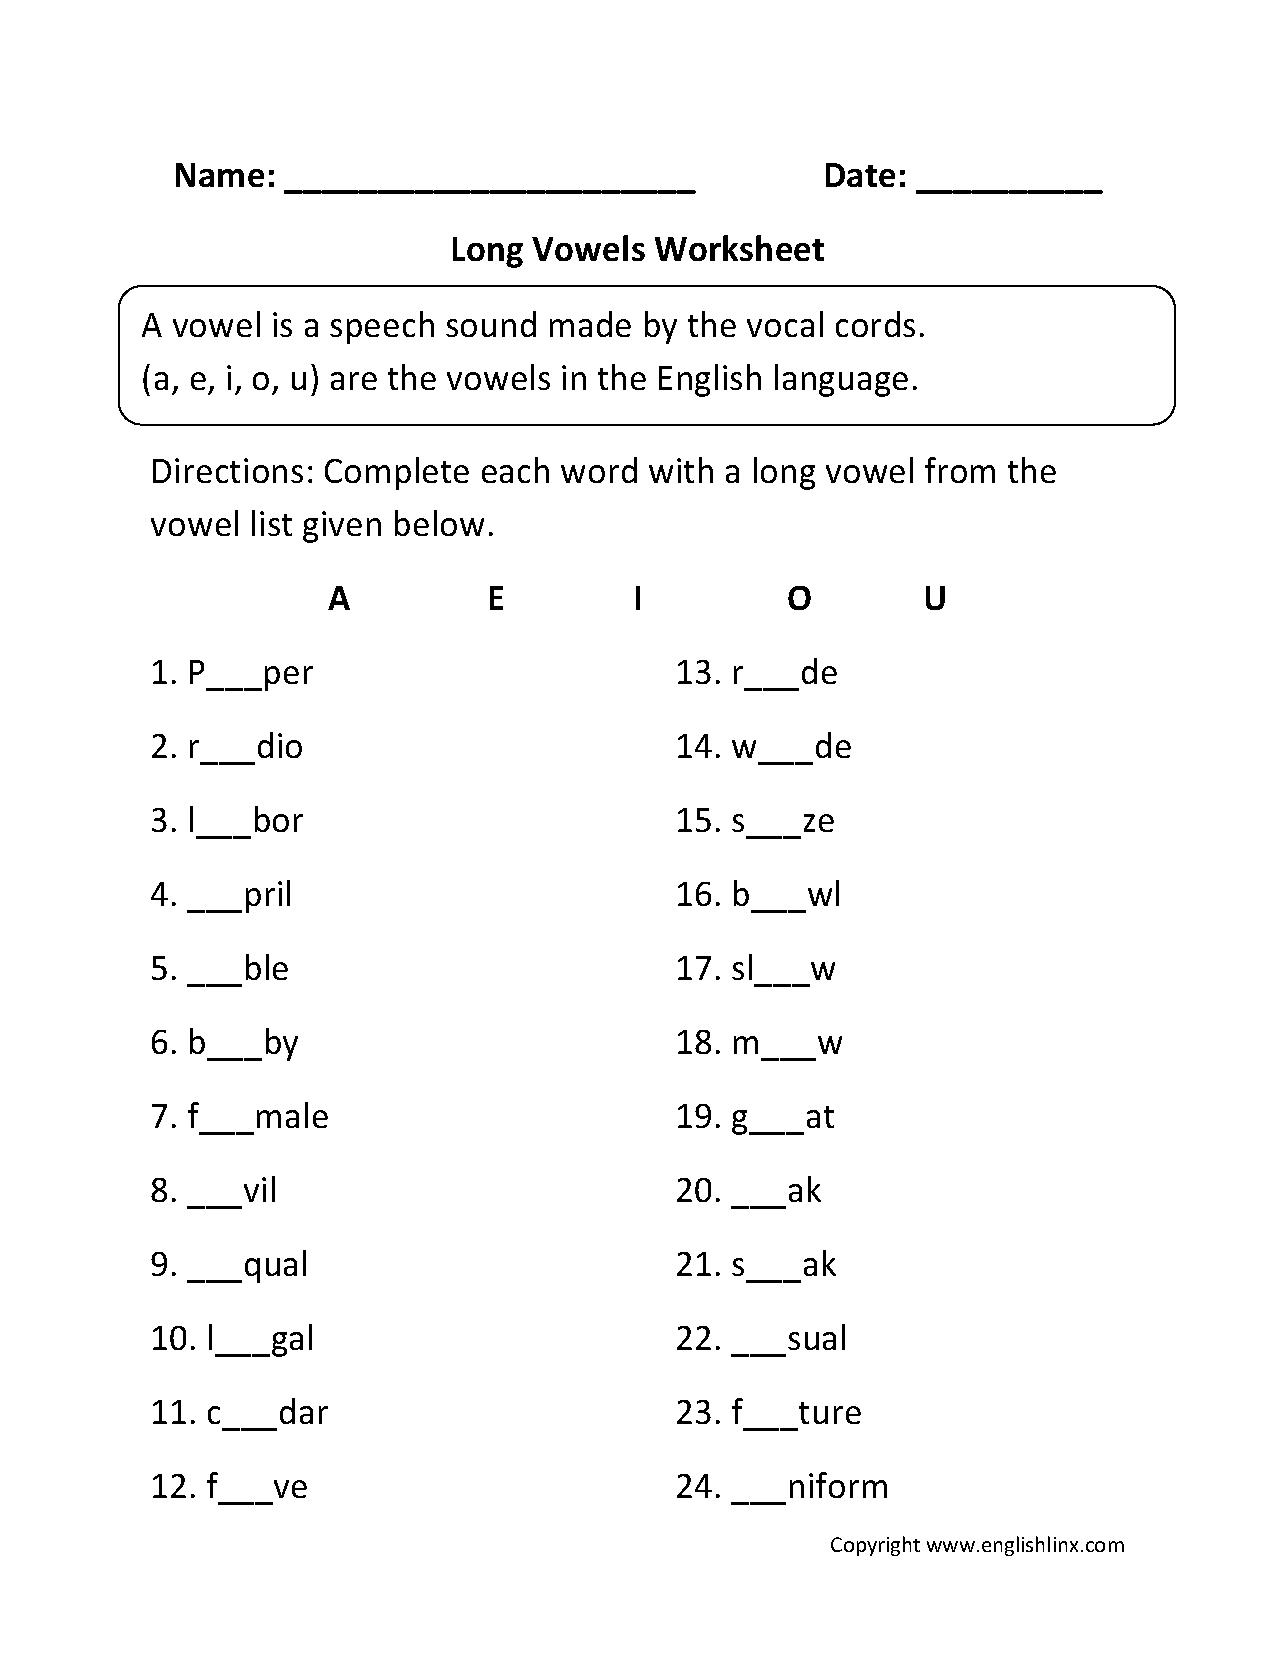 Greetings To Fill In Worksheet